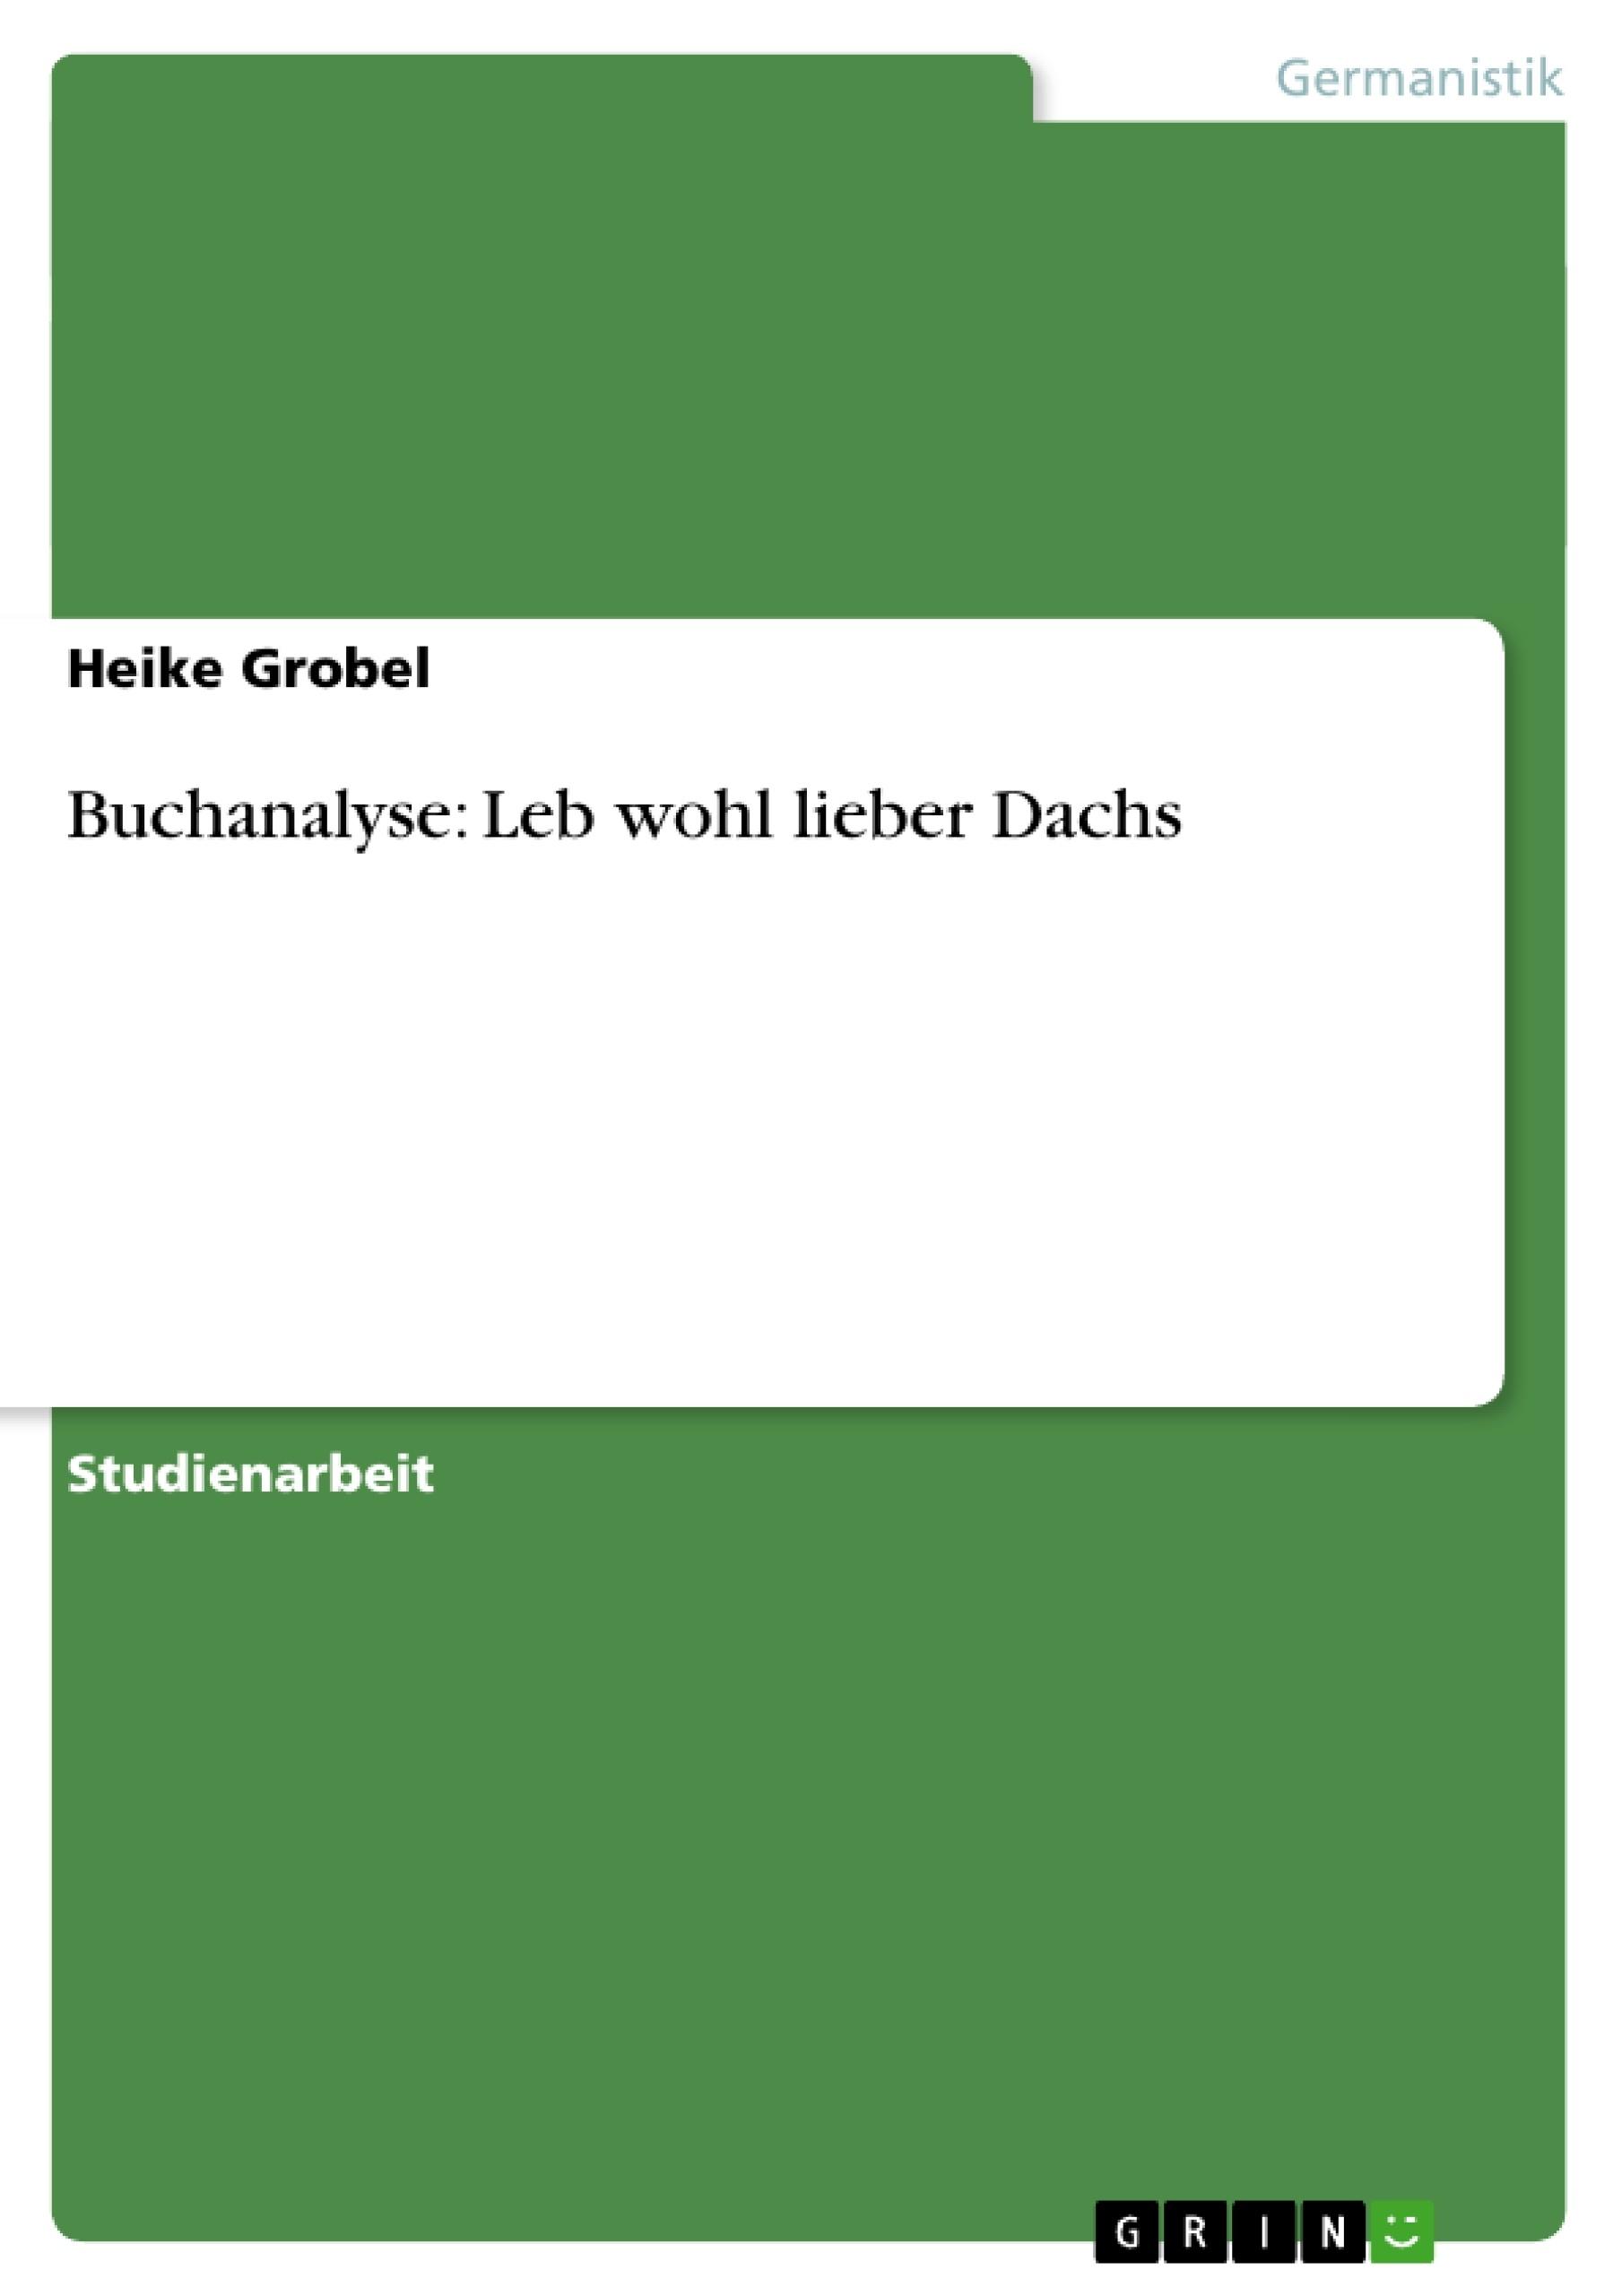 Titel: Buchanalyse: Leb wohl lieber Dachs